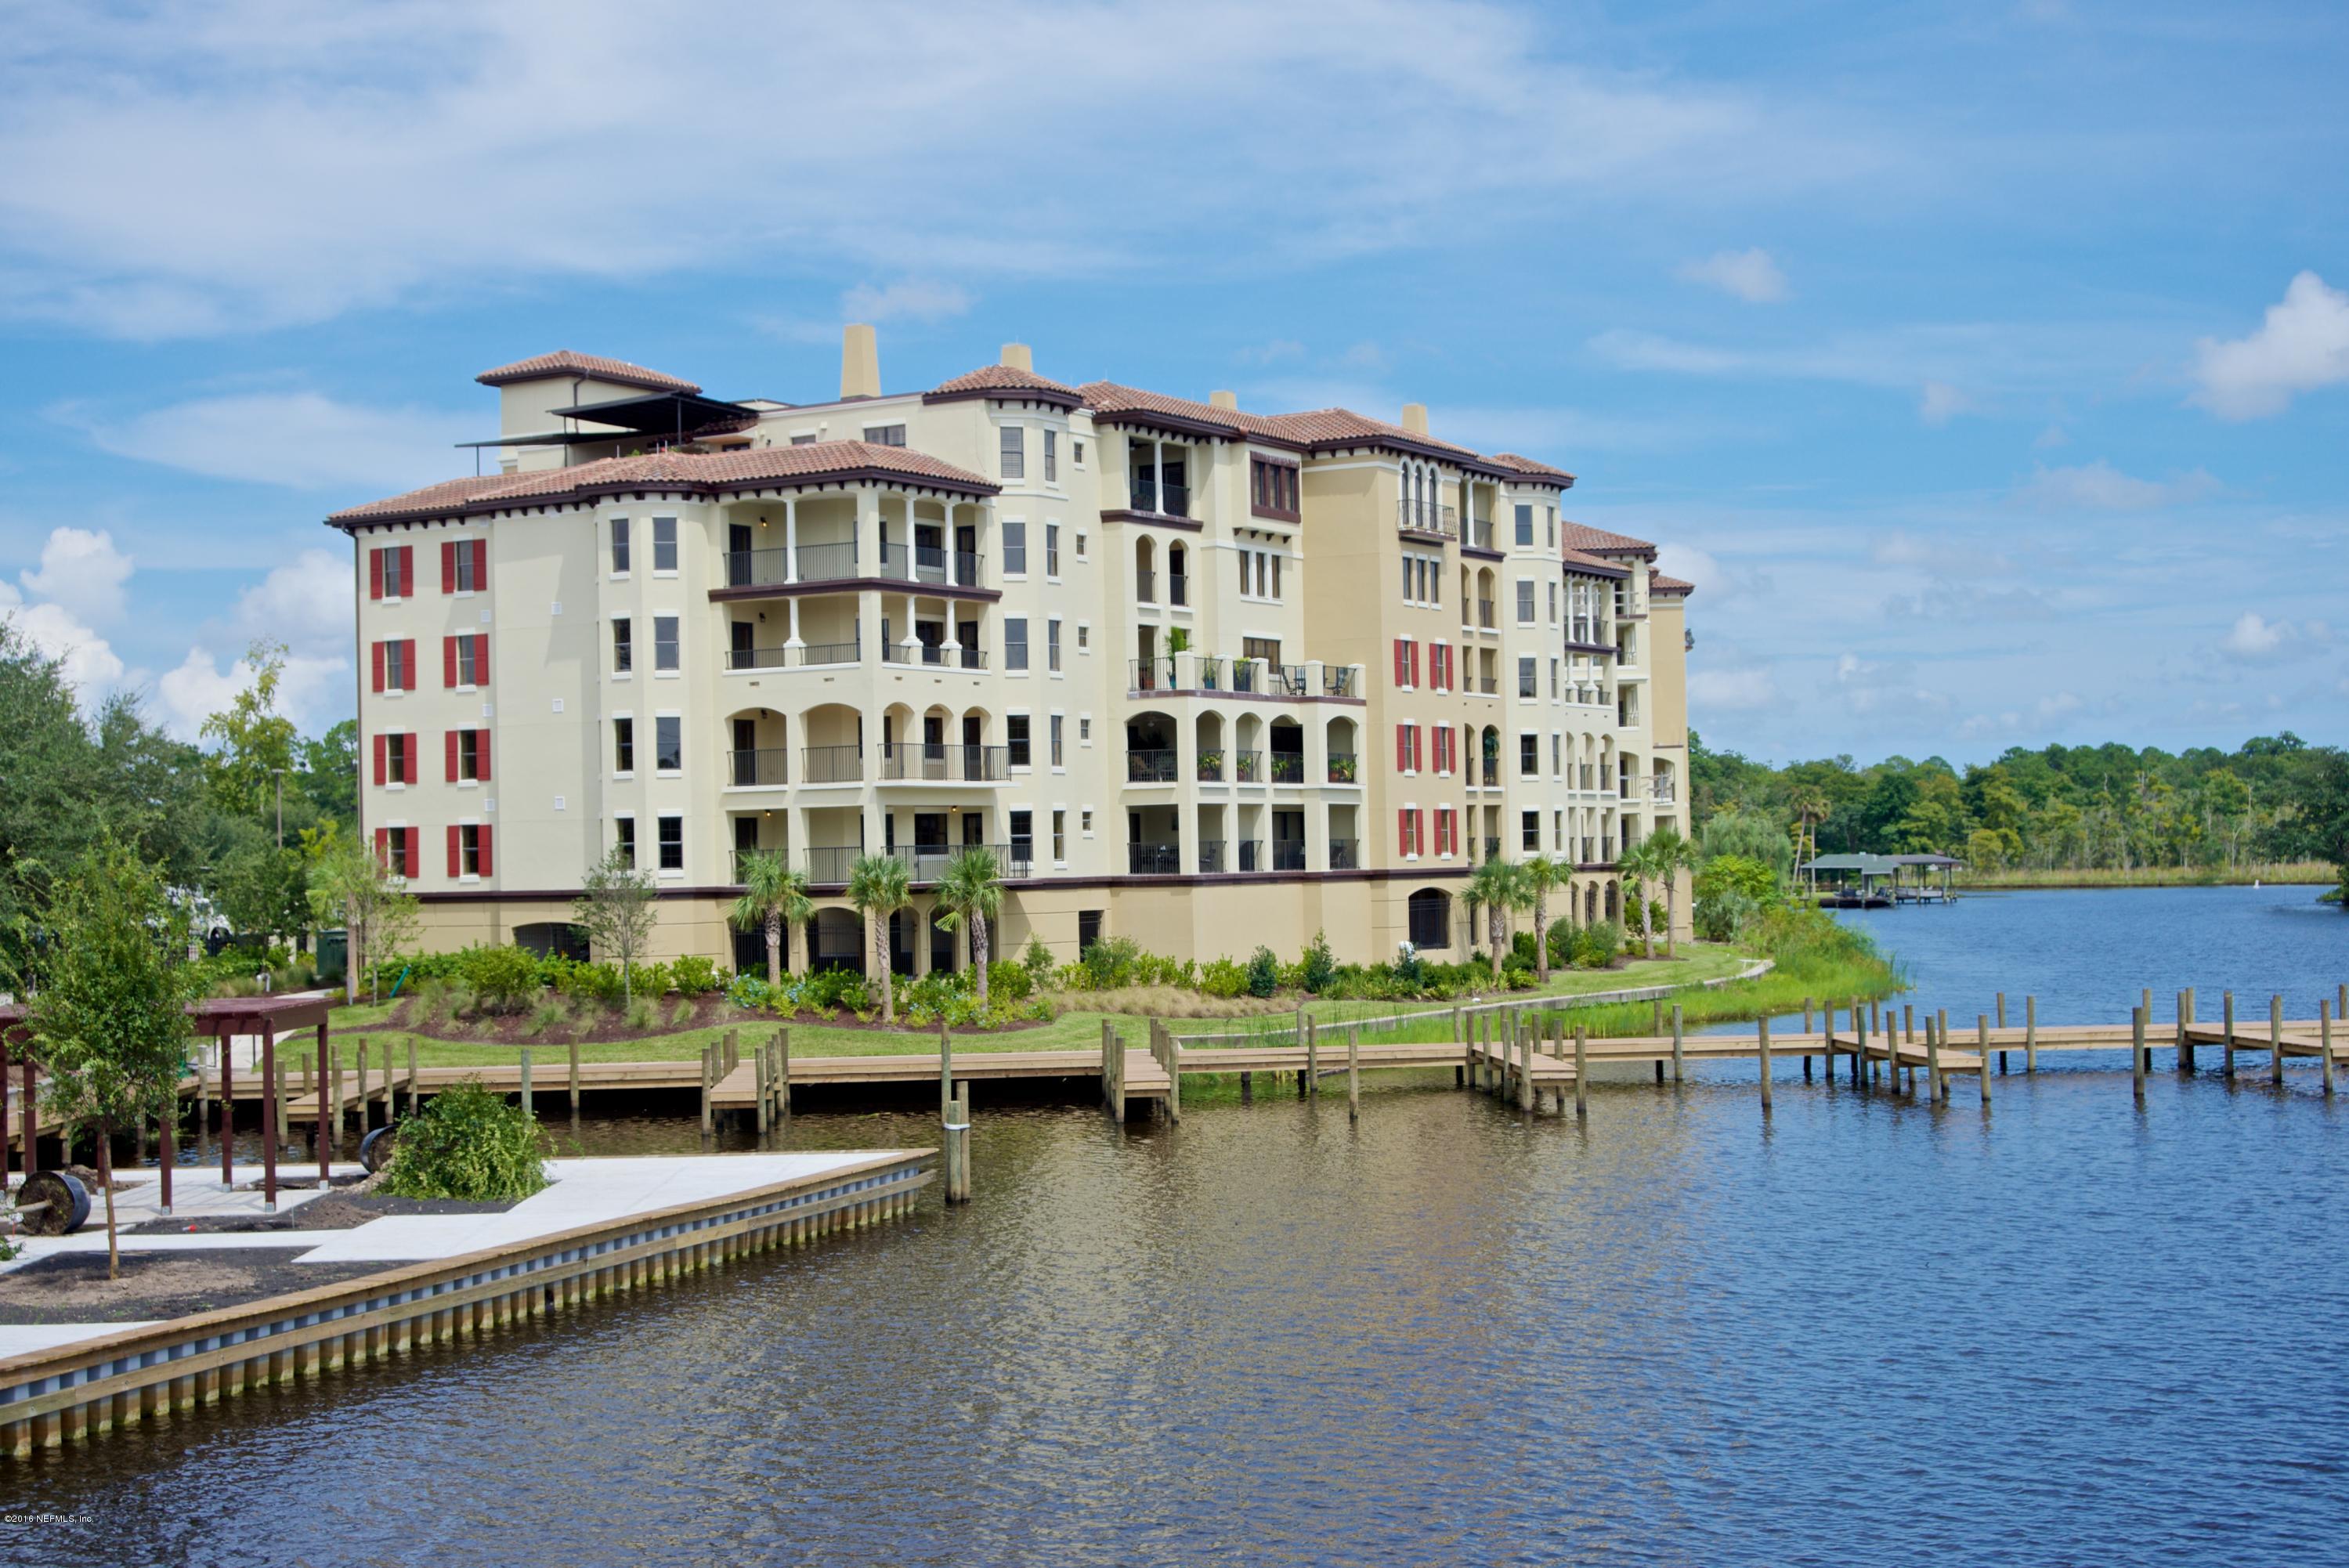 3958 BAYMEADOWS, JACKSONVILLE, FLORIDA 32217, 4 Bedrooms Bedrooms, ,3 BathroomsBathrooms,Residential,For sale,BAYMEADOWS,1051764